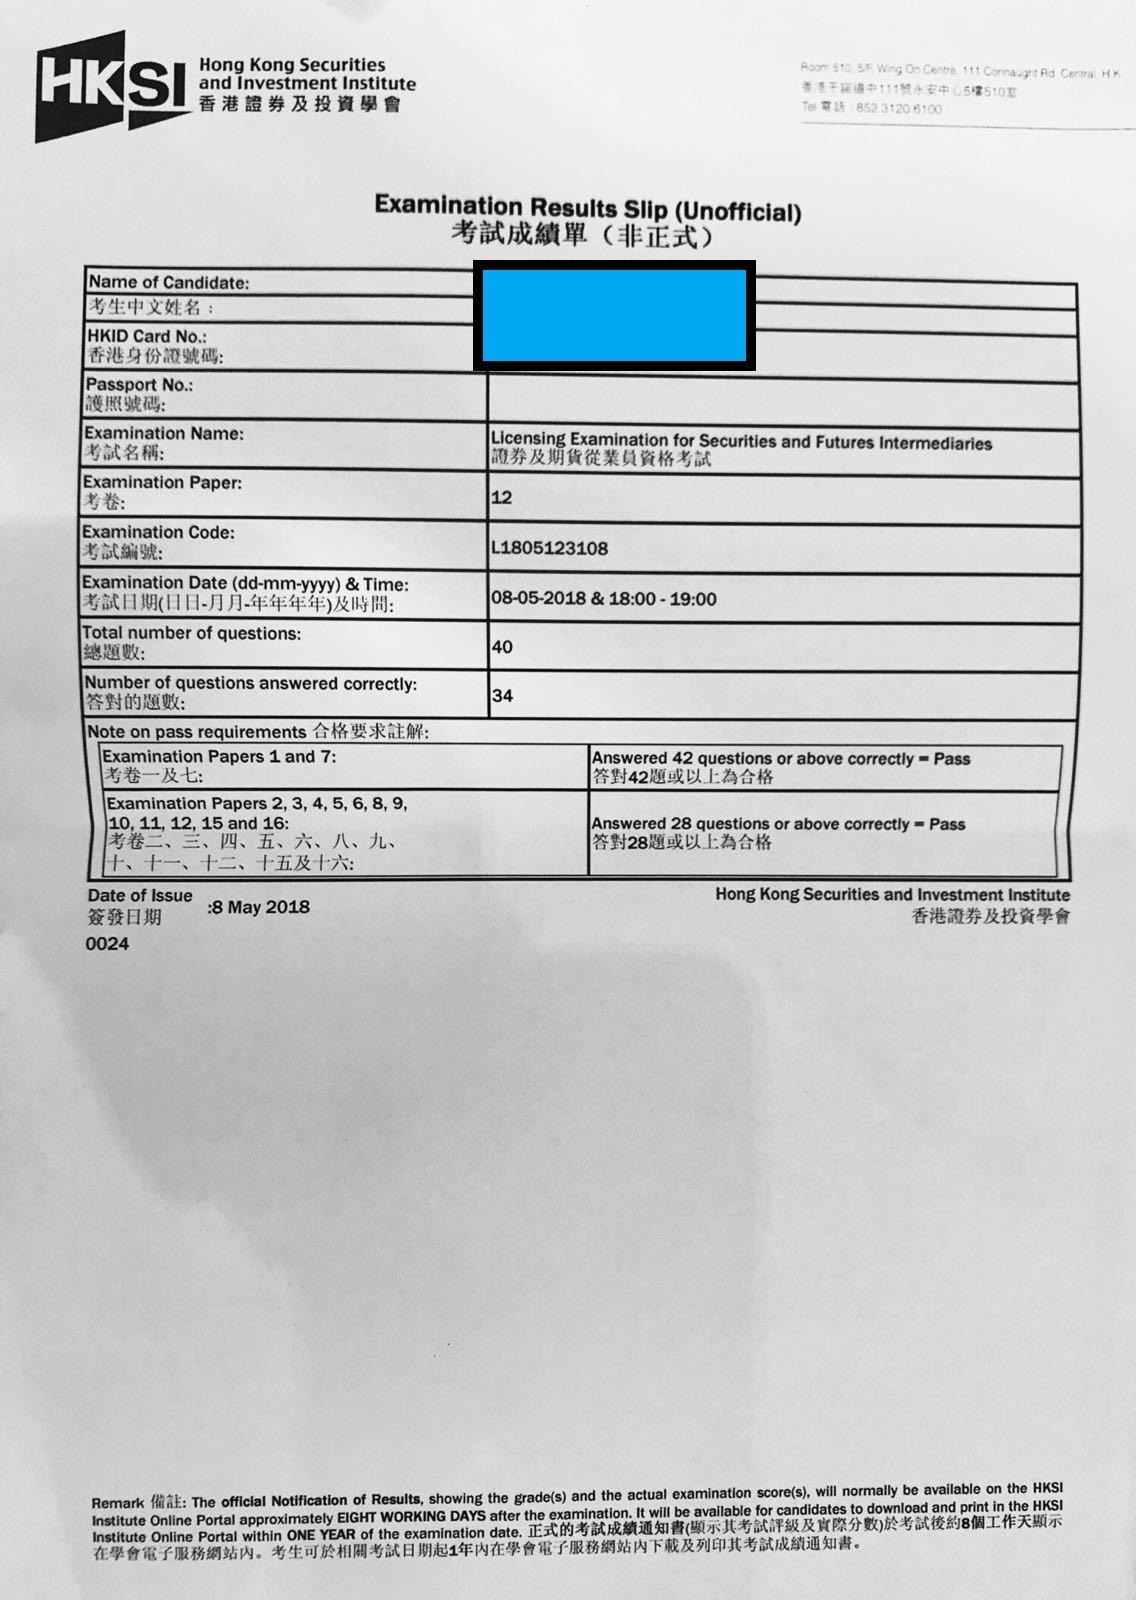 CL 8/5/2018 LE Paper 12 證券期貨從業員資格考試卷十二 Pass